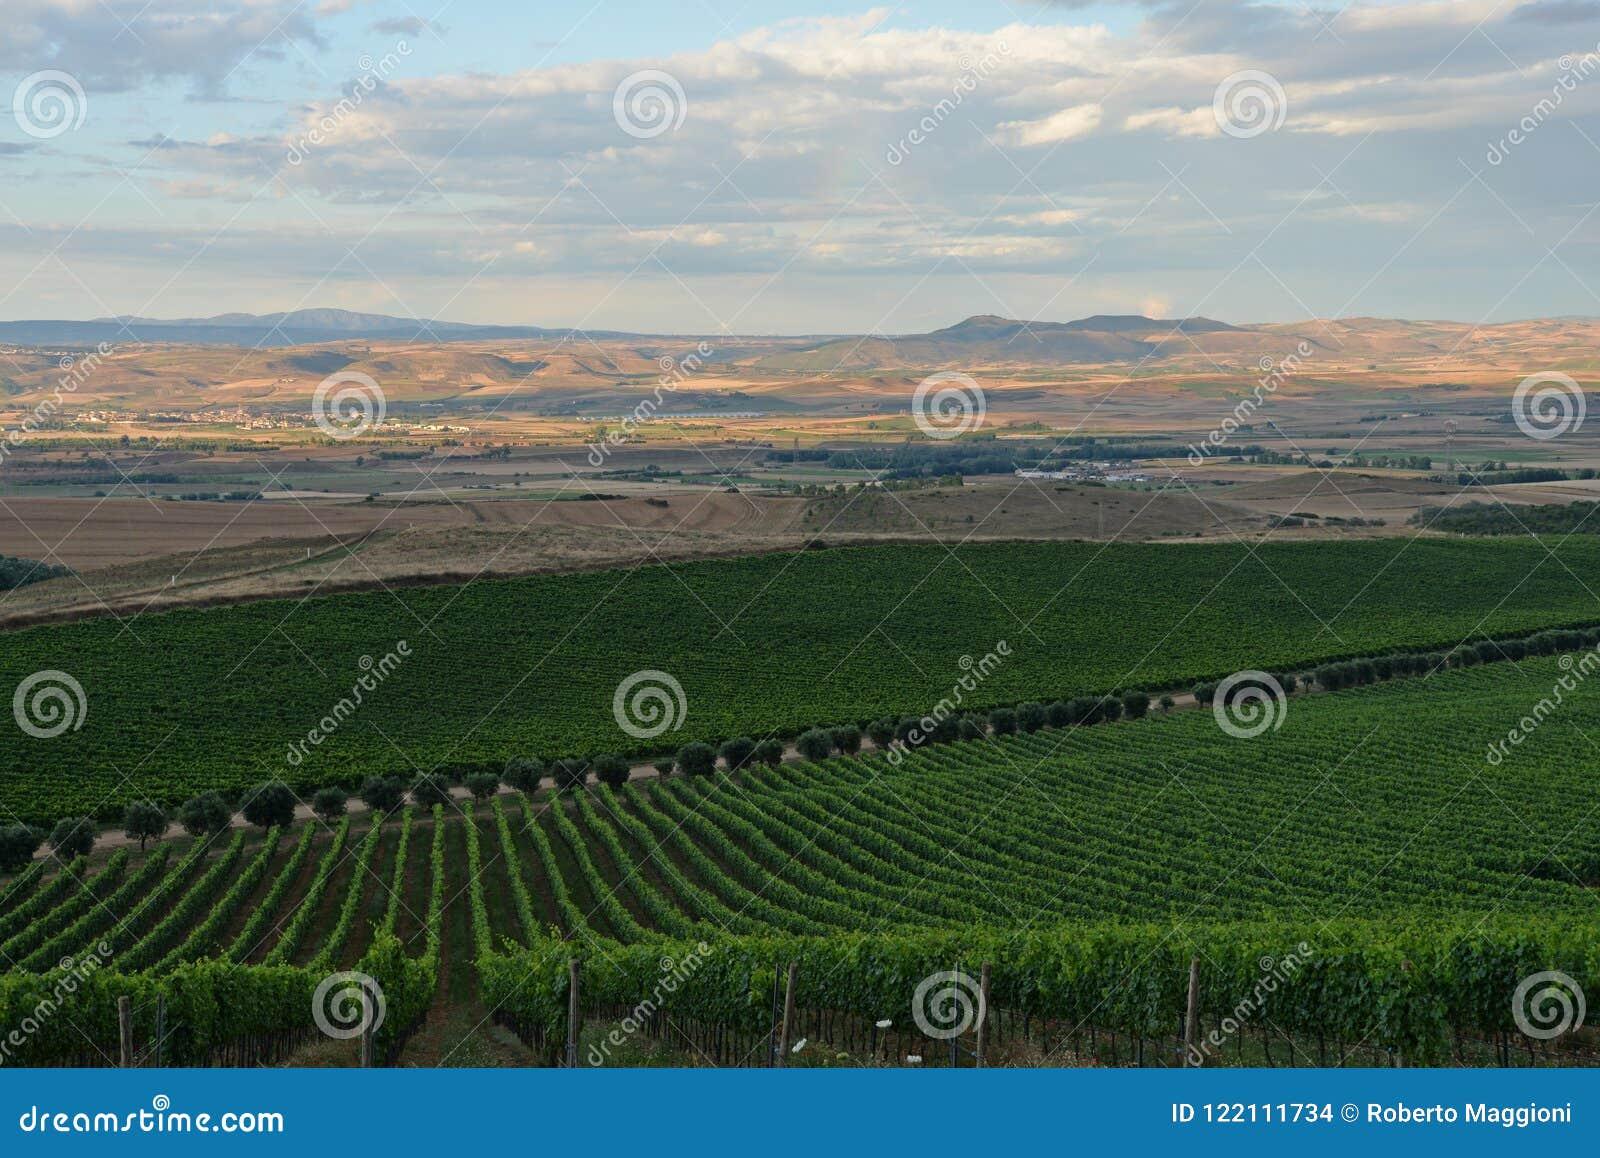 Region of Sardinia, Italy. Vineyard landscape